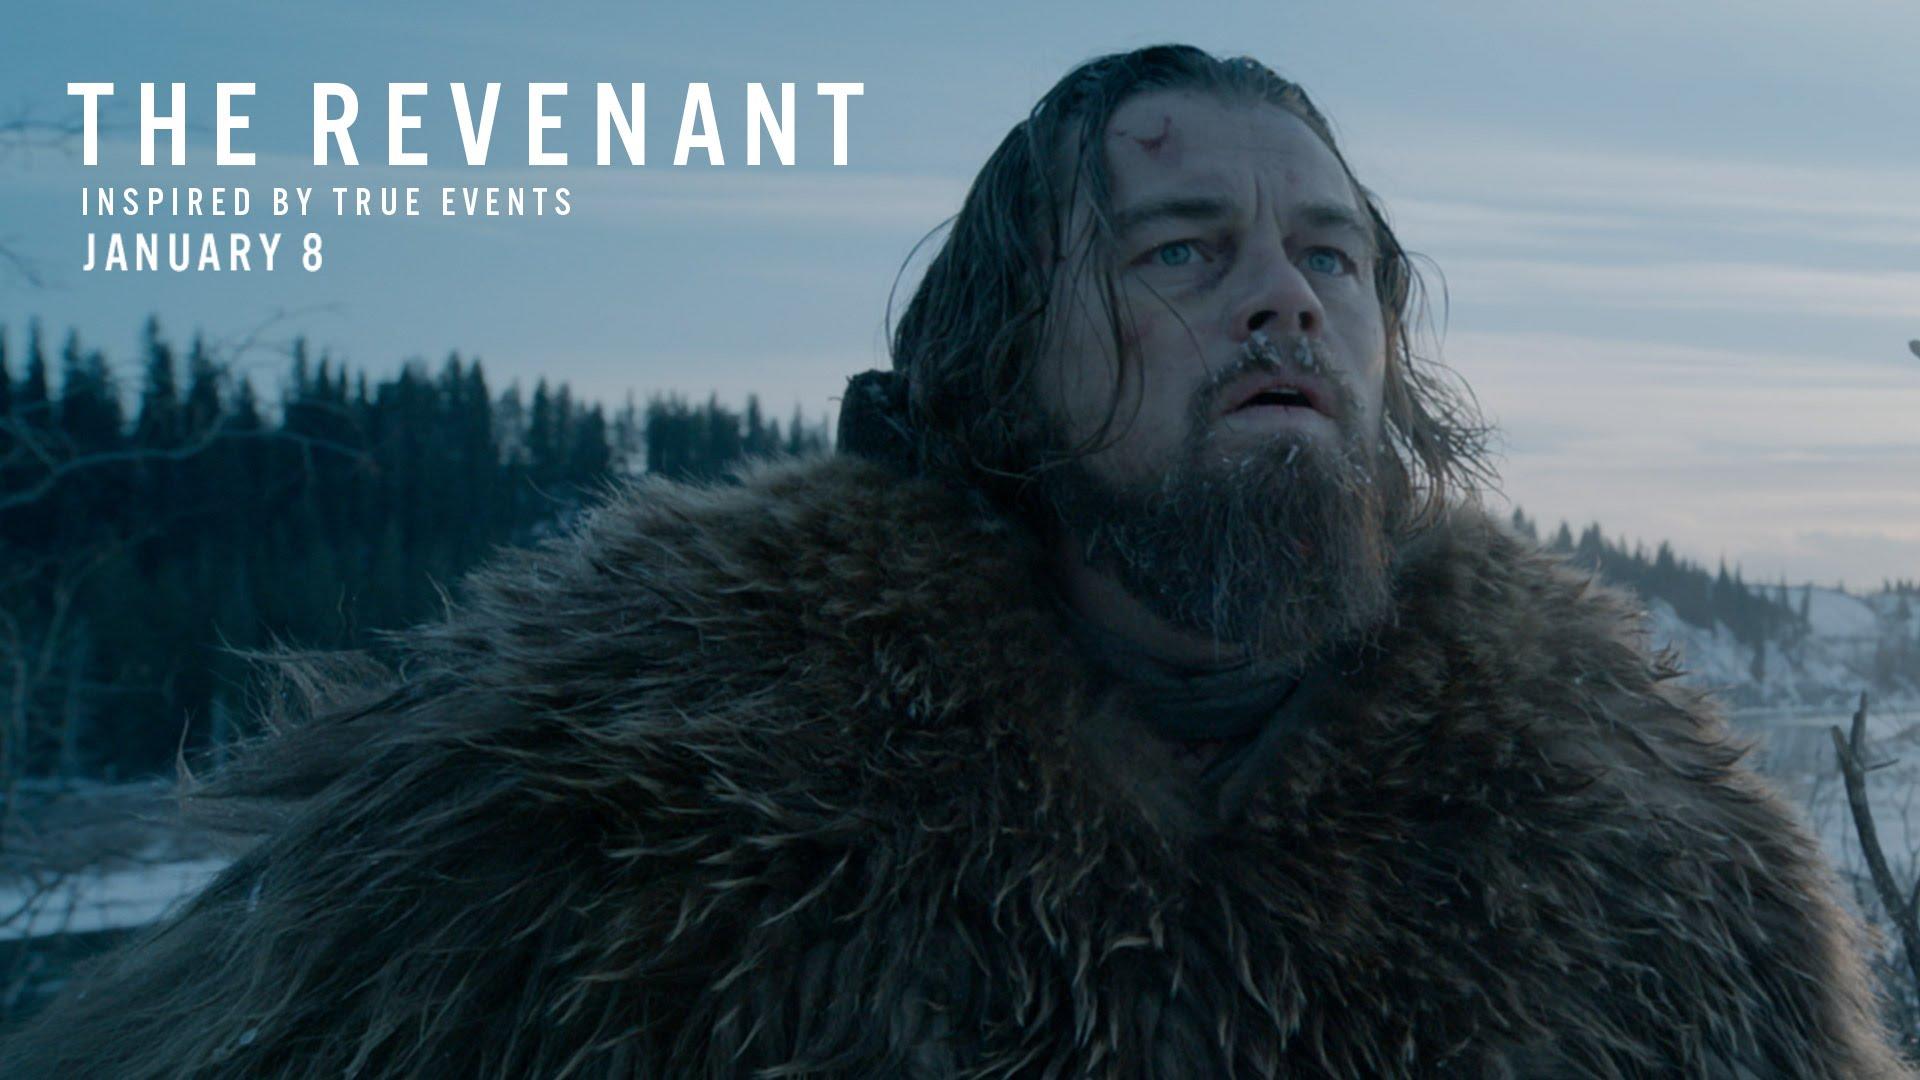 The Reveneant